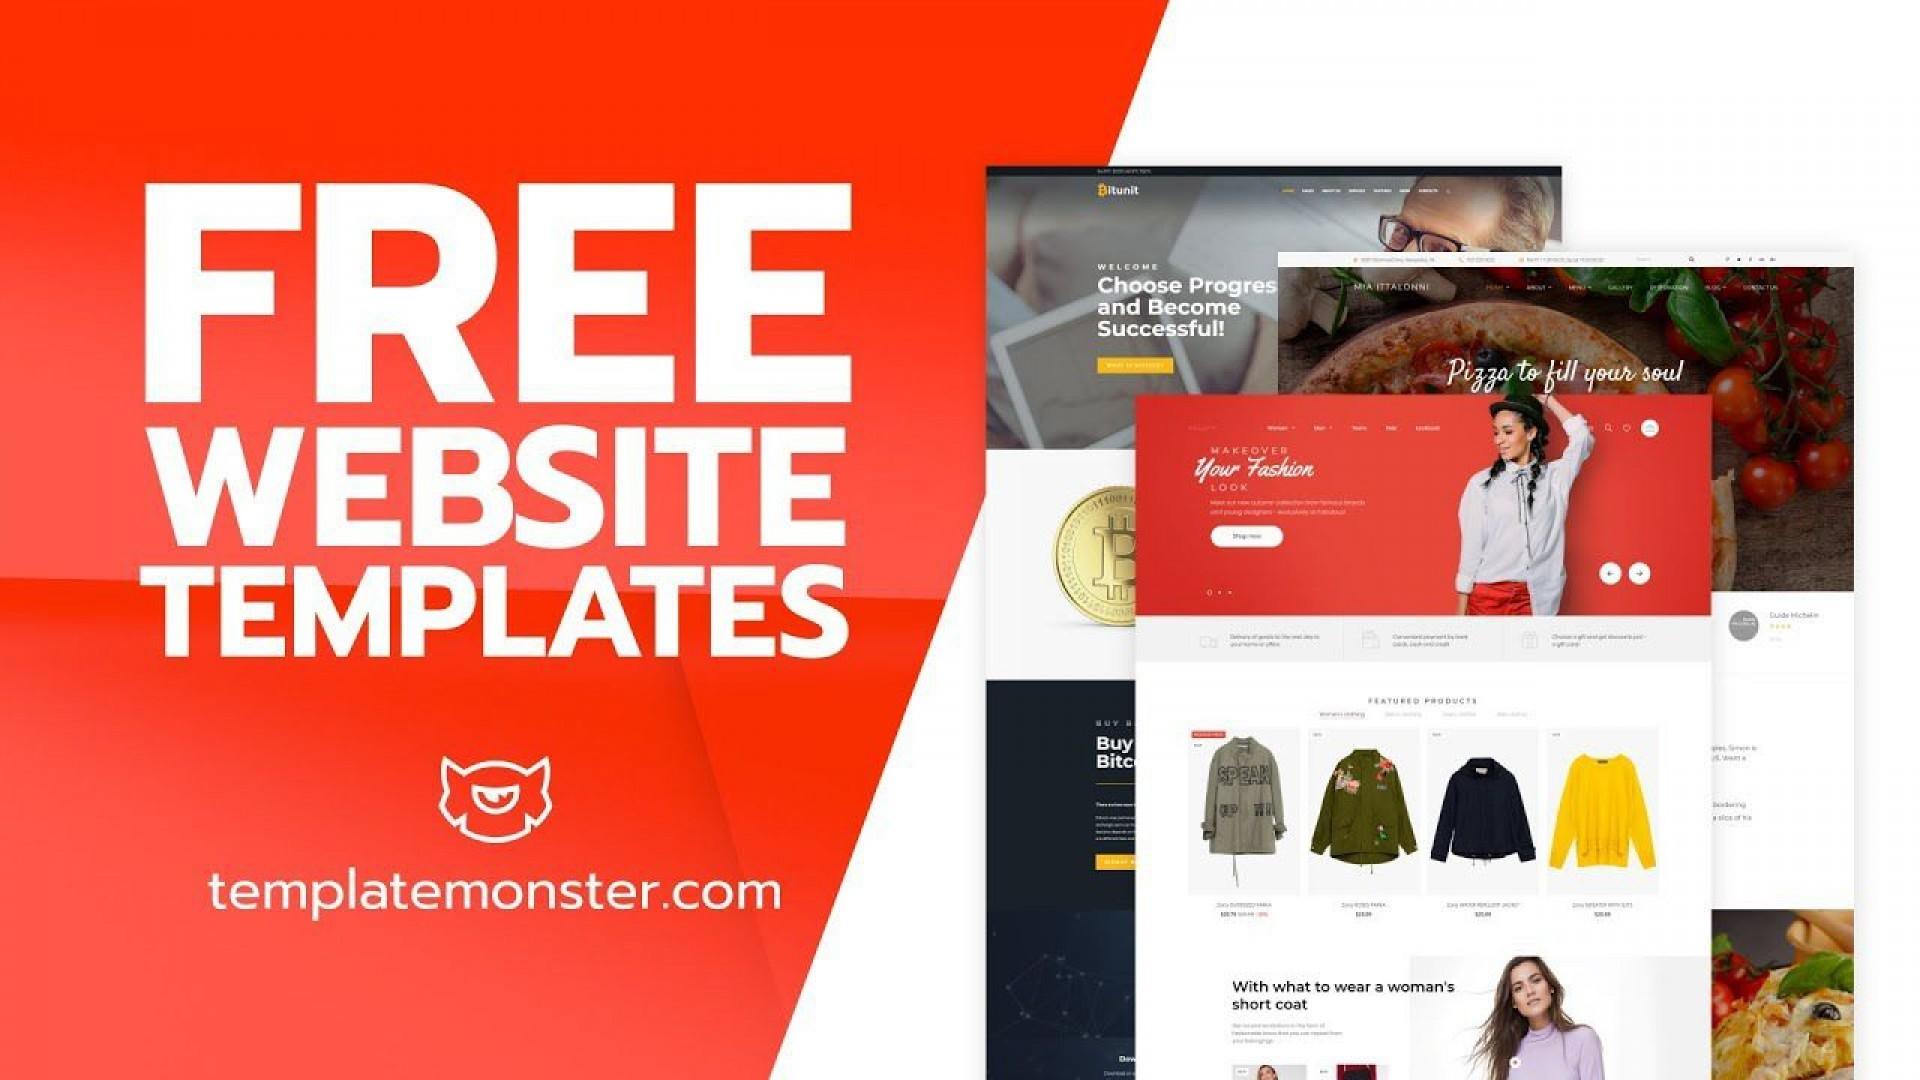 006 Stupendou Free Professional Web Design Template Inspiration  Templates Website Download1920